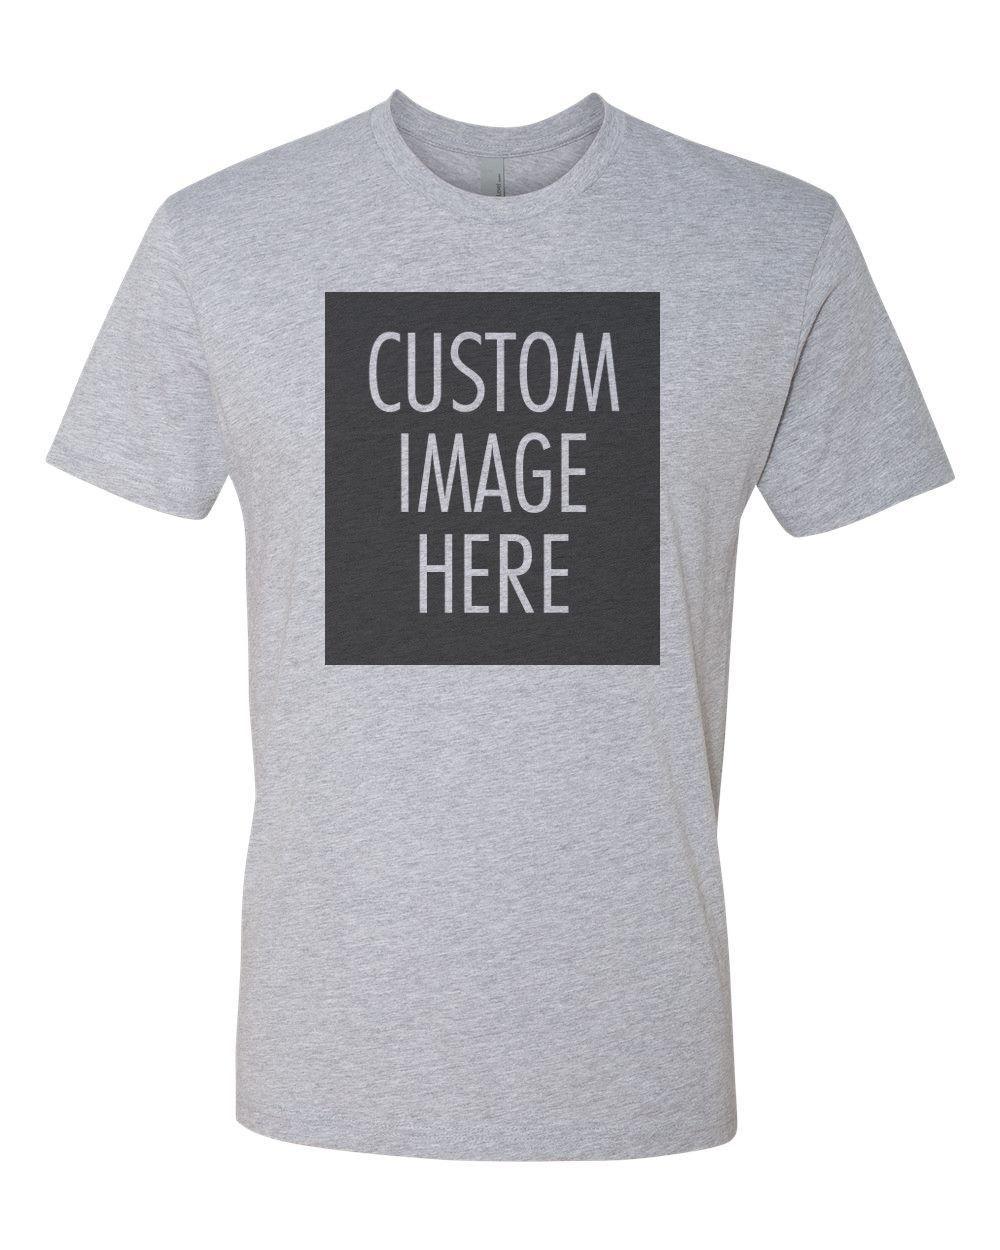 d2fc7c54bebf6 Compre Camiseta Personalizada Con Tu Foto